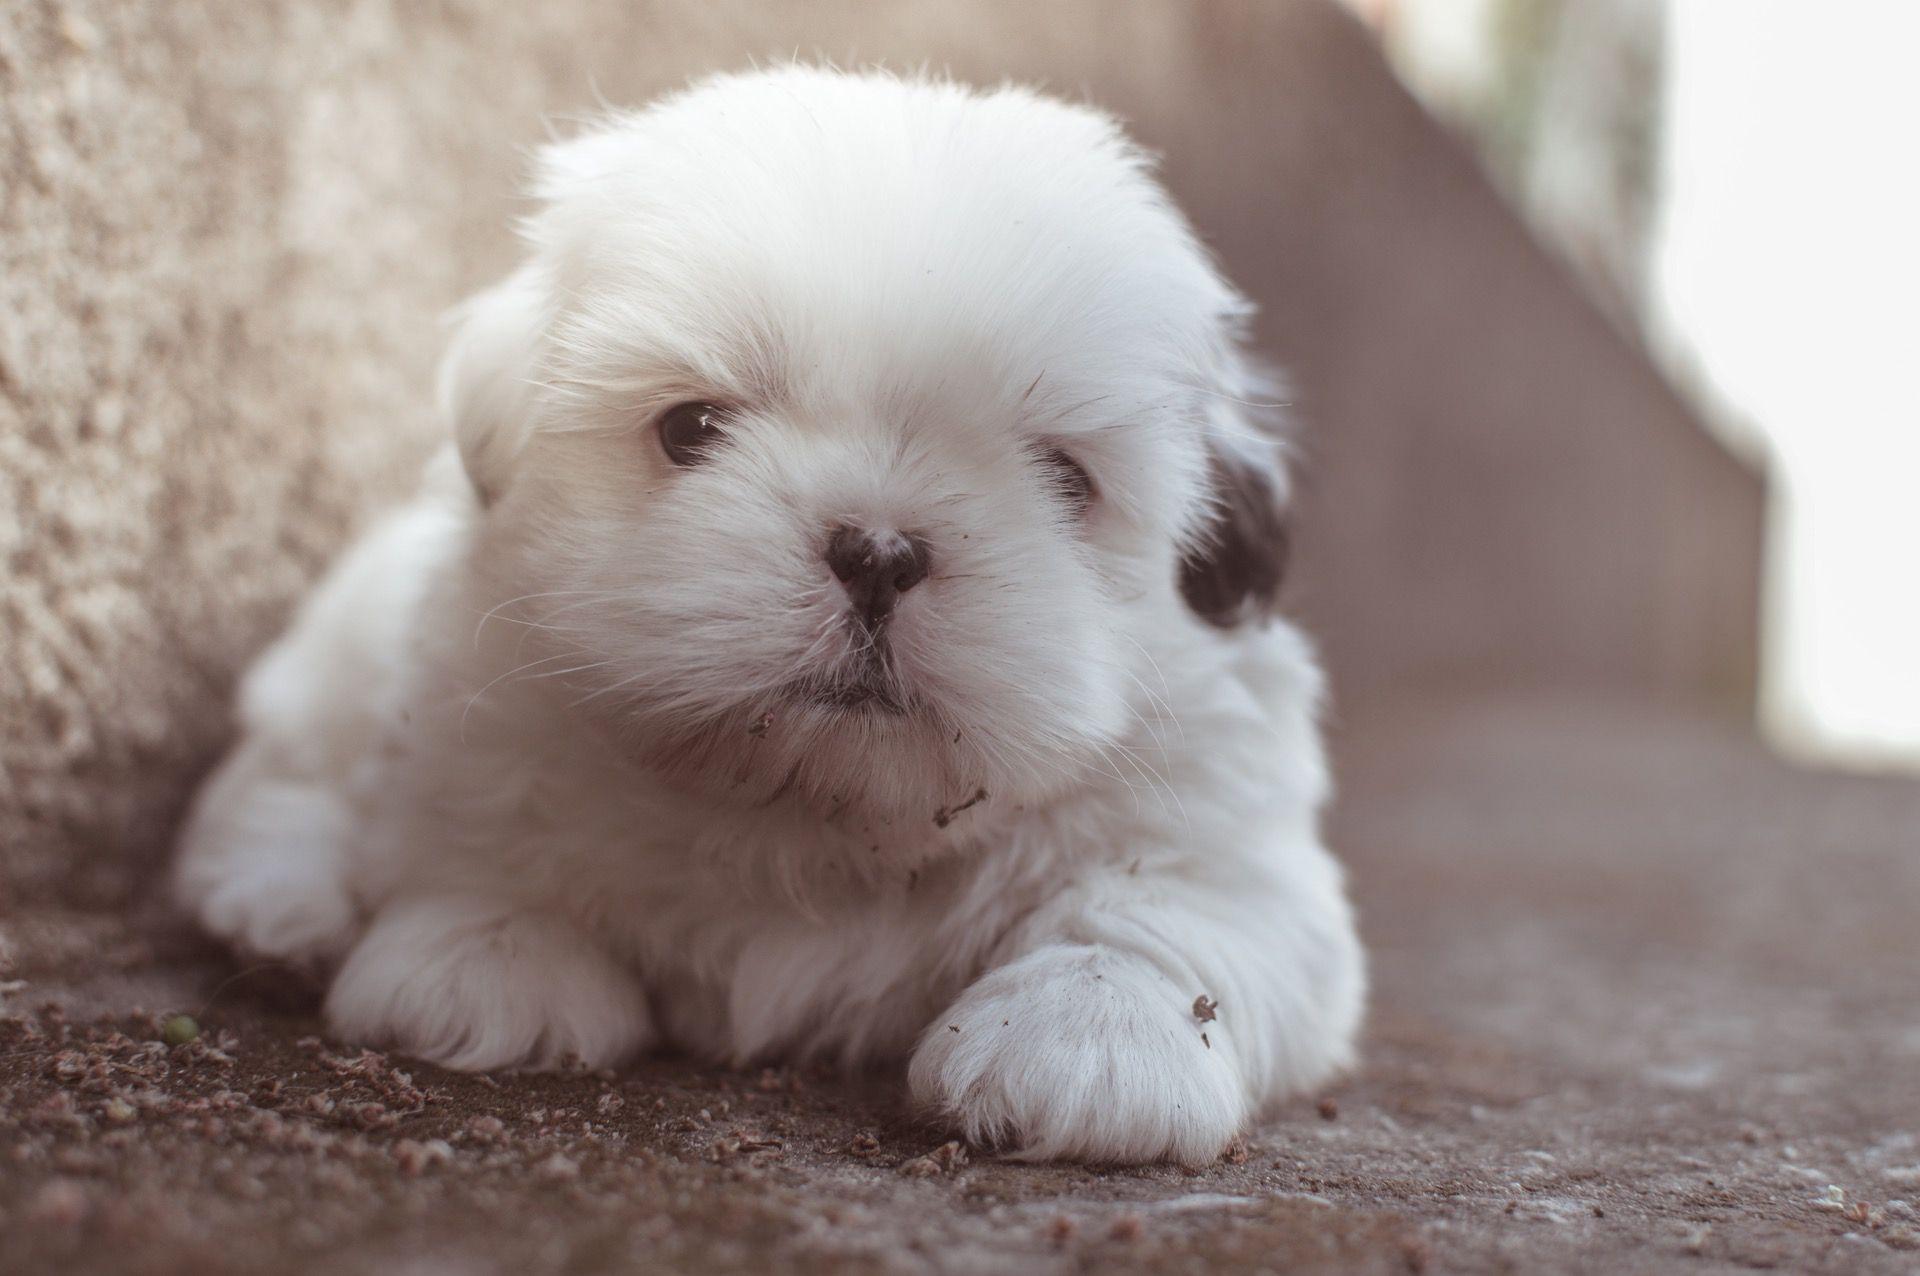 Pretty Puppy http://ift.tt/2n8Udsk